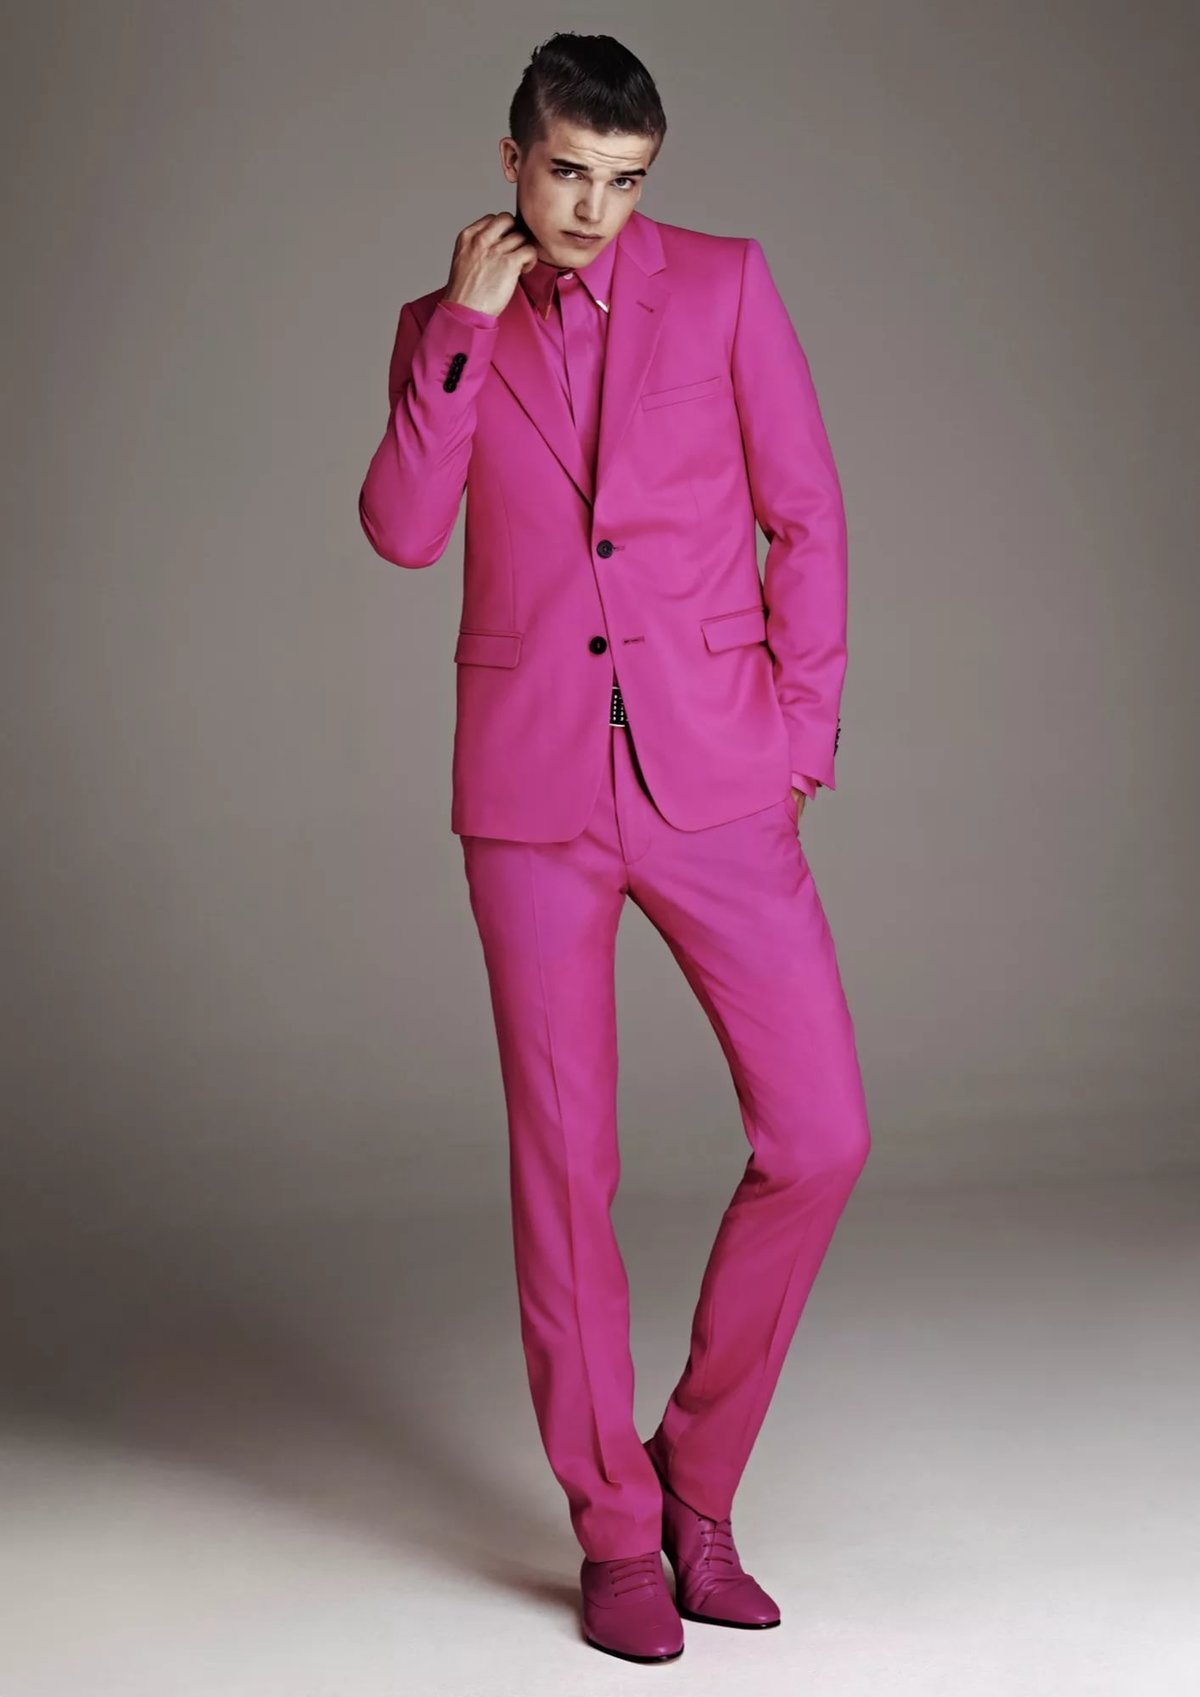 доменное пацан в розовом костюме лейтмотивом при